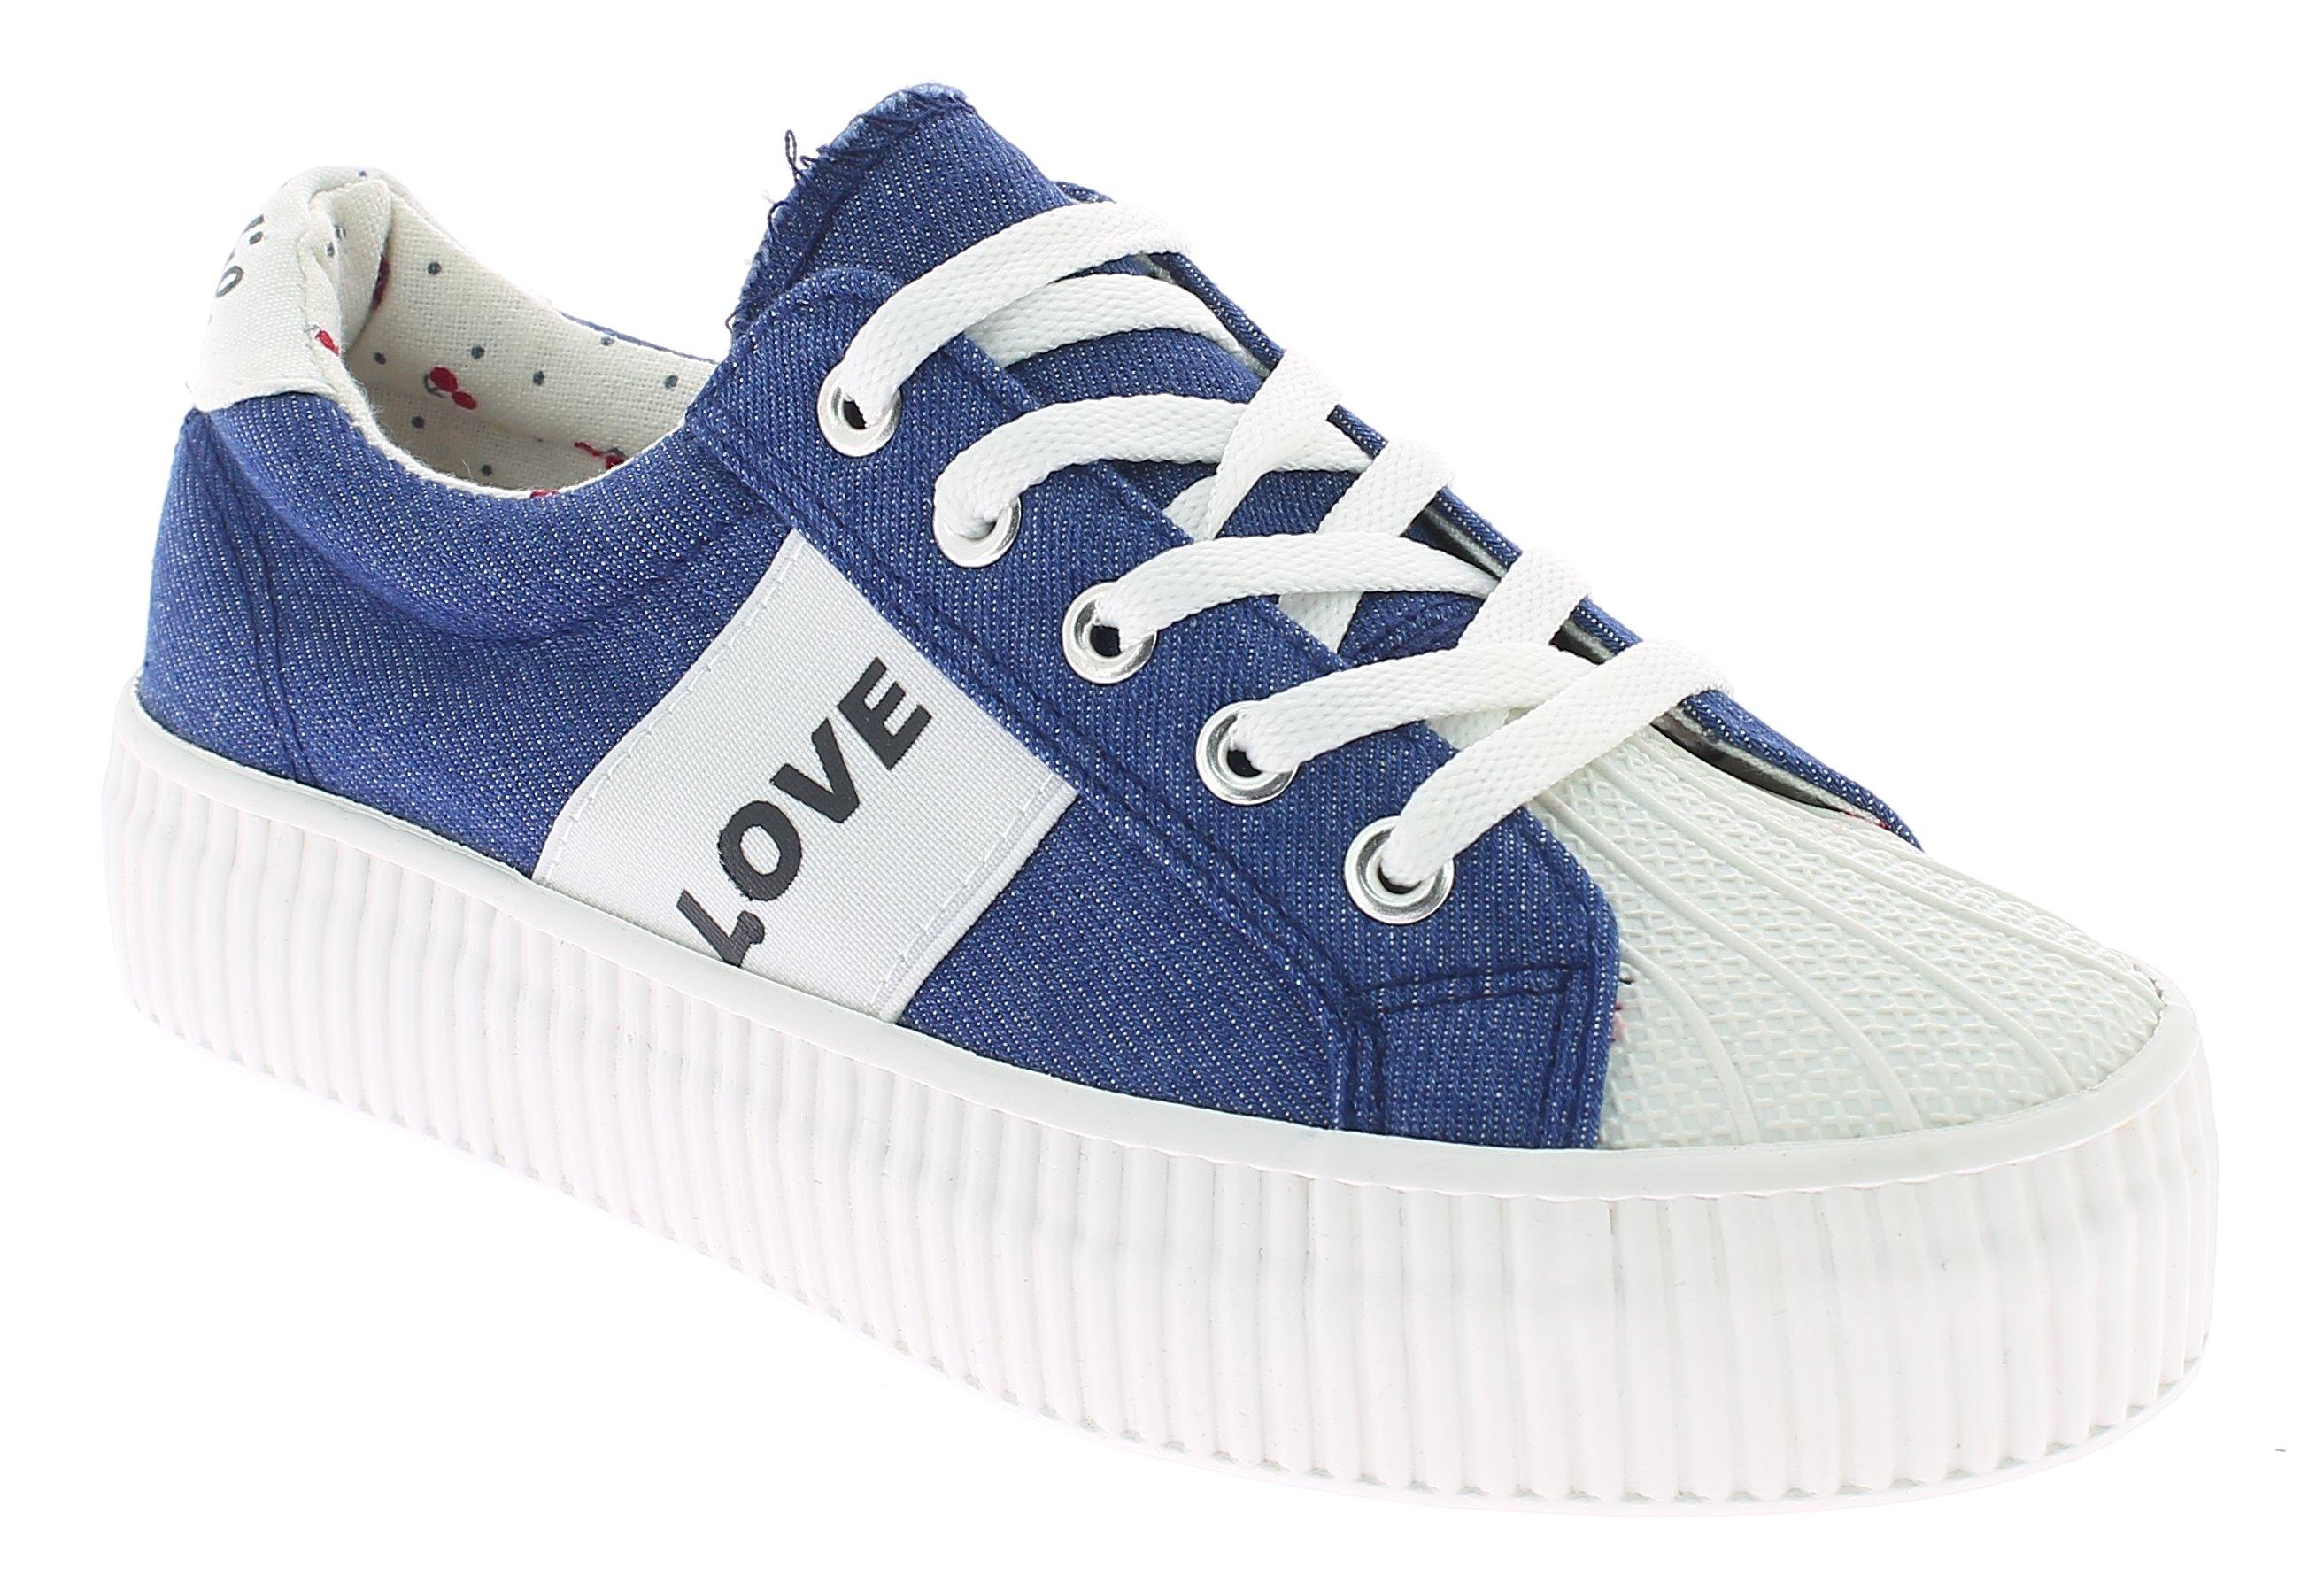 KYLIE Γυναικείο Casual K1720302 Τζίν - IqShoes - K1720302 JEAN-blue-41/1/23/28 προϊόντα παπούτσια